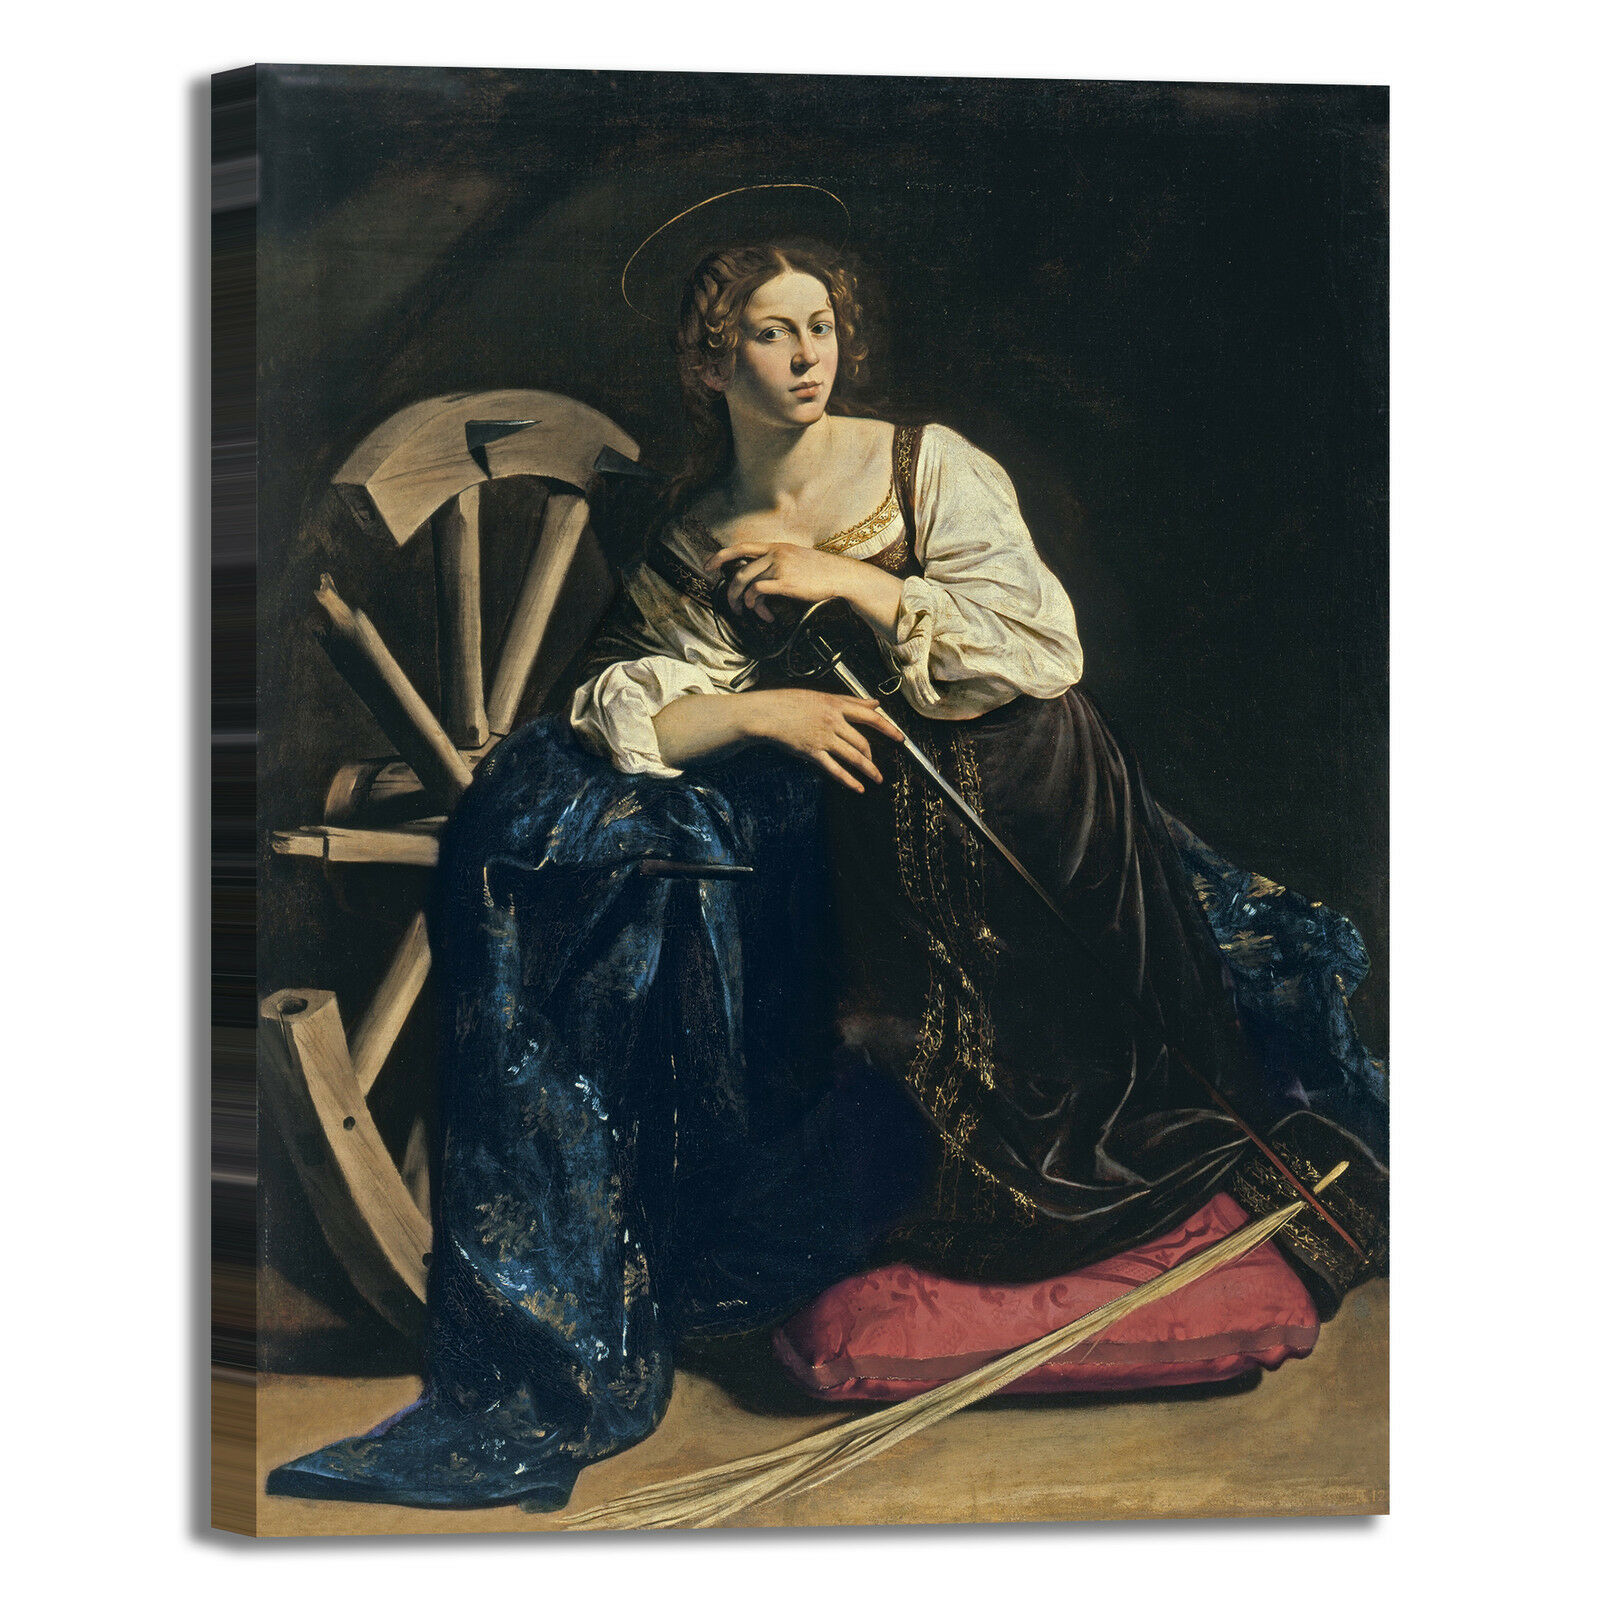 Caravaggio d'Alessandria santa Caterina d'Alessandria Caravaggio quadro stampa tela dipinto arRouge o casa cffb1c